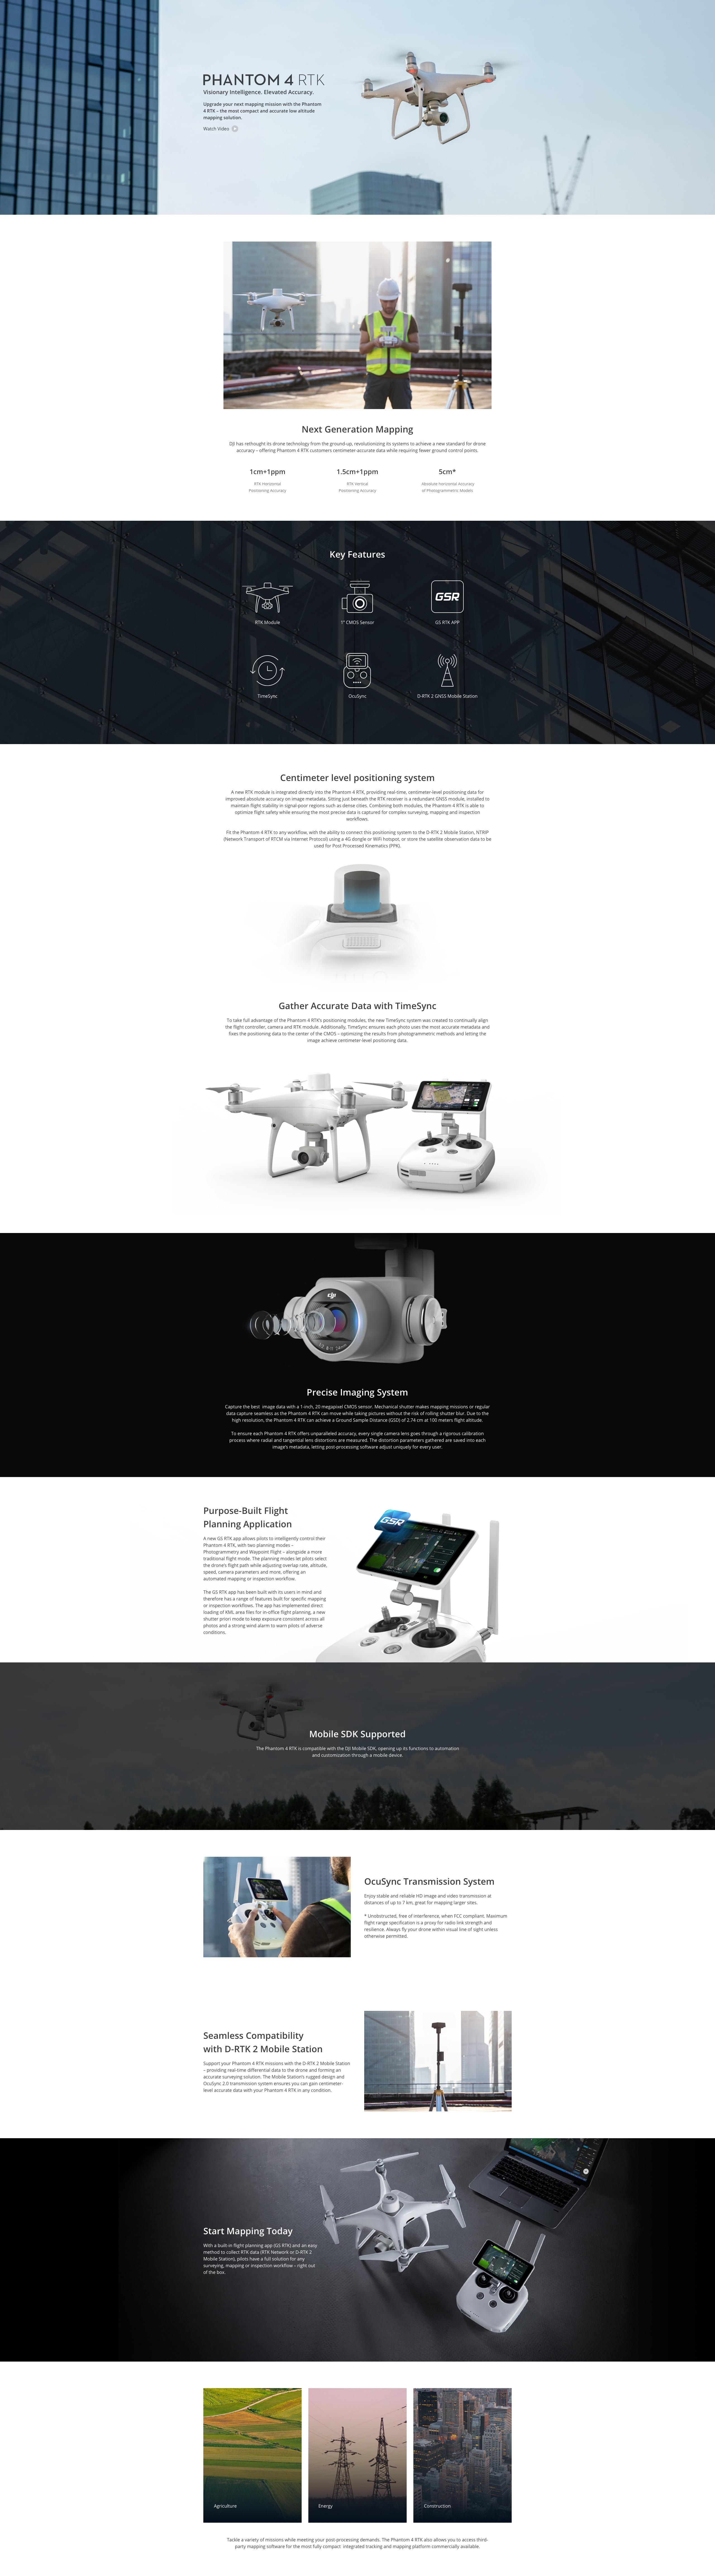 p4rtk-web.jpg